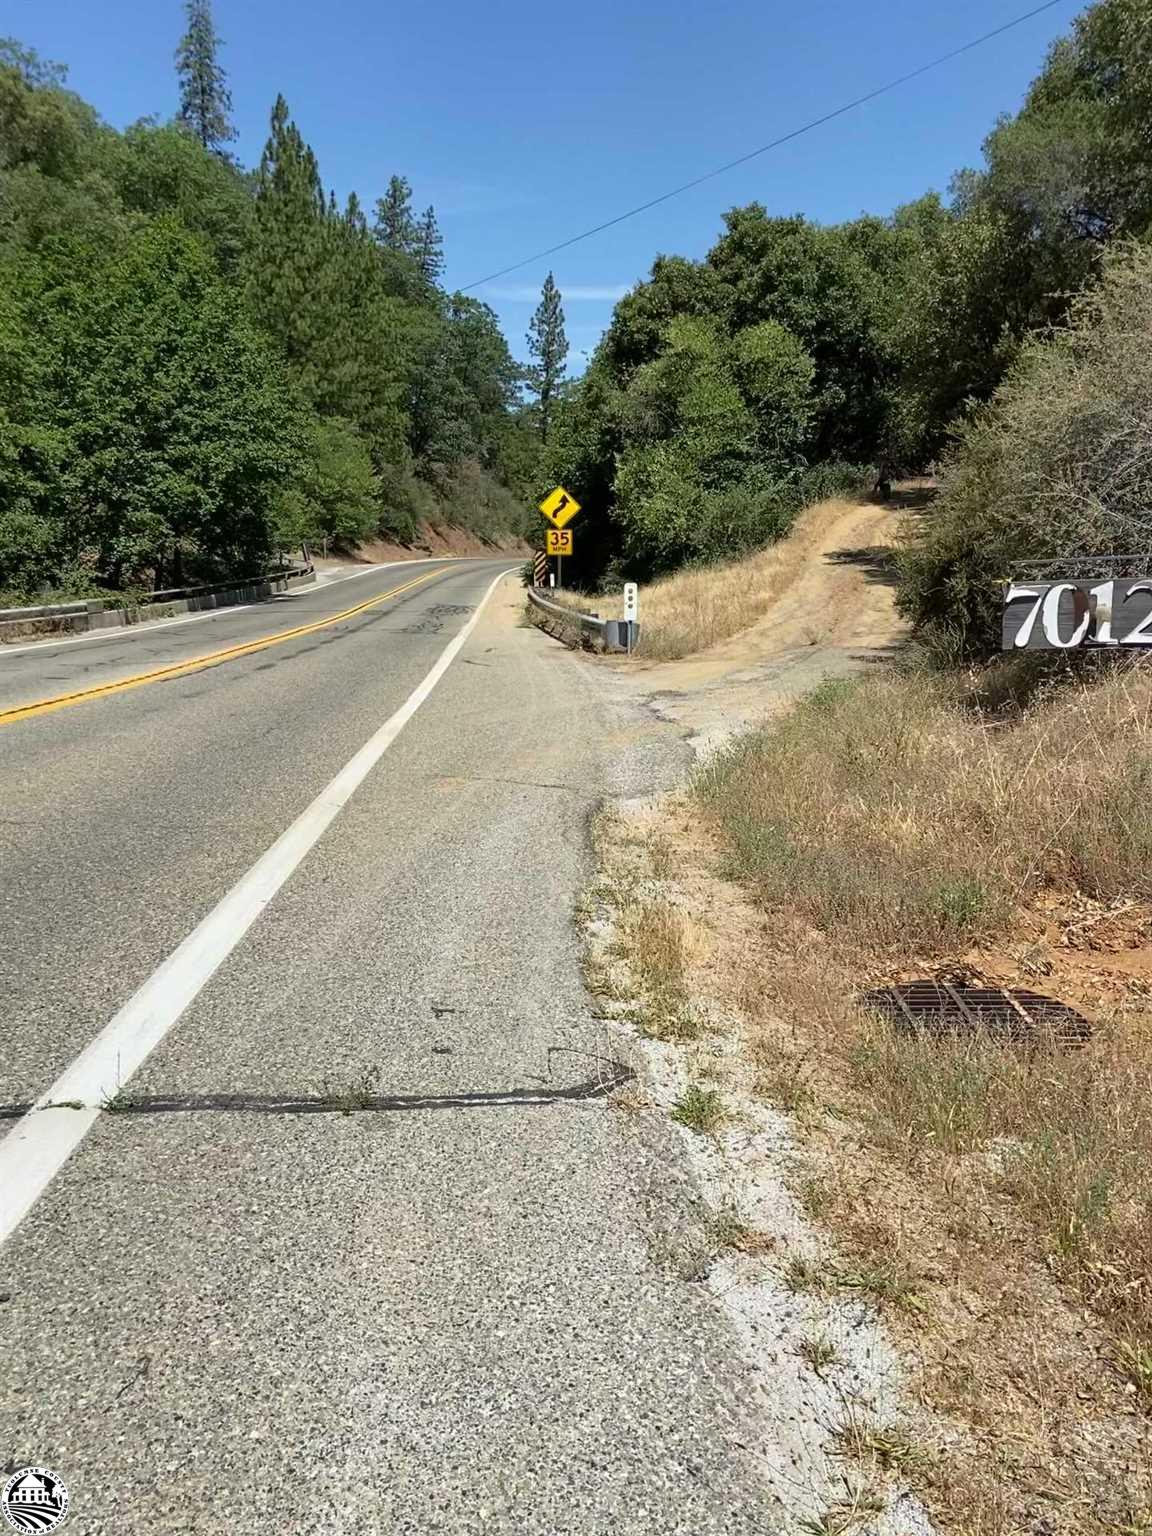 7018 Highway 140, Mariposa, CA 95345